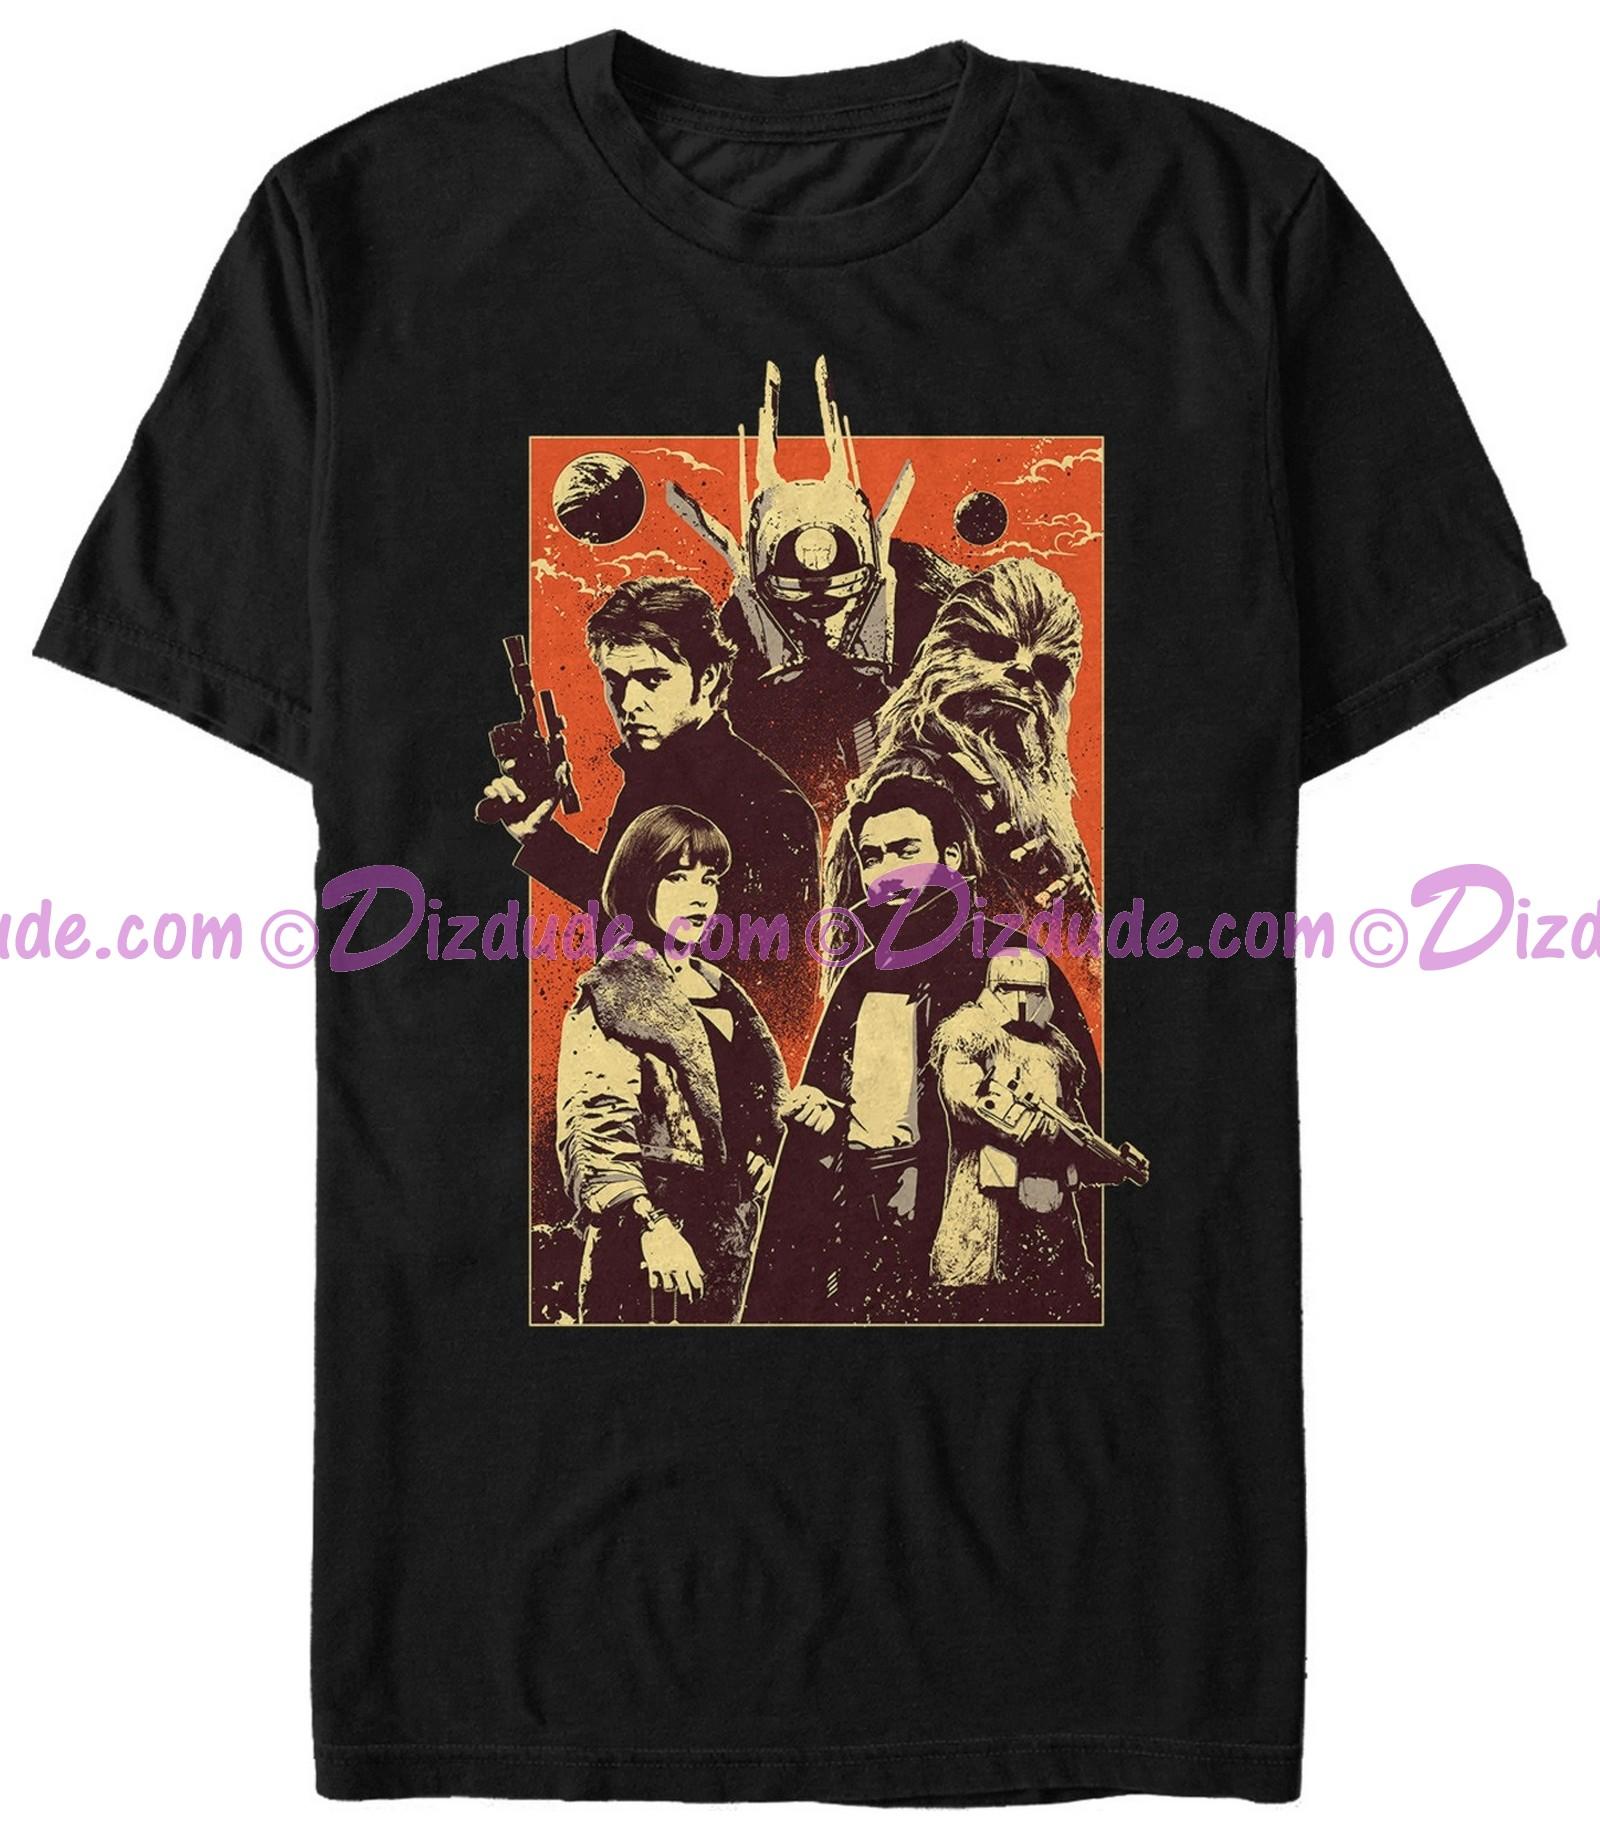 SOLO A Star Wars Story Character Poster Adult T-Shirt (Tshirt, T shirt or Tee)  © Dizdude.com